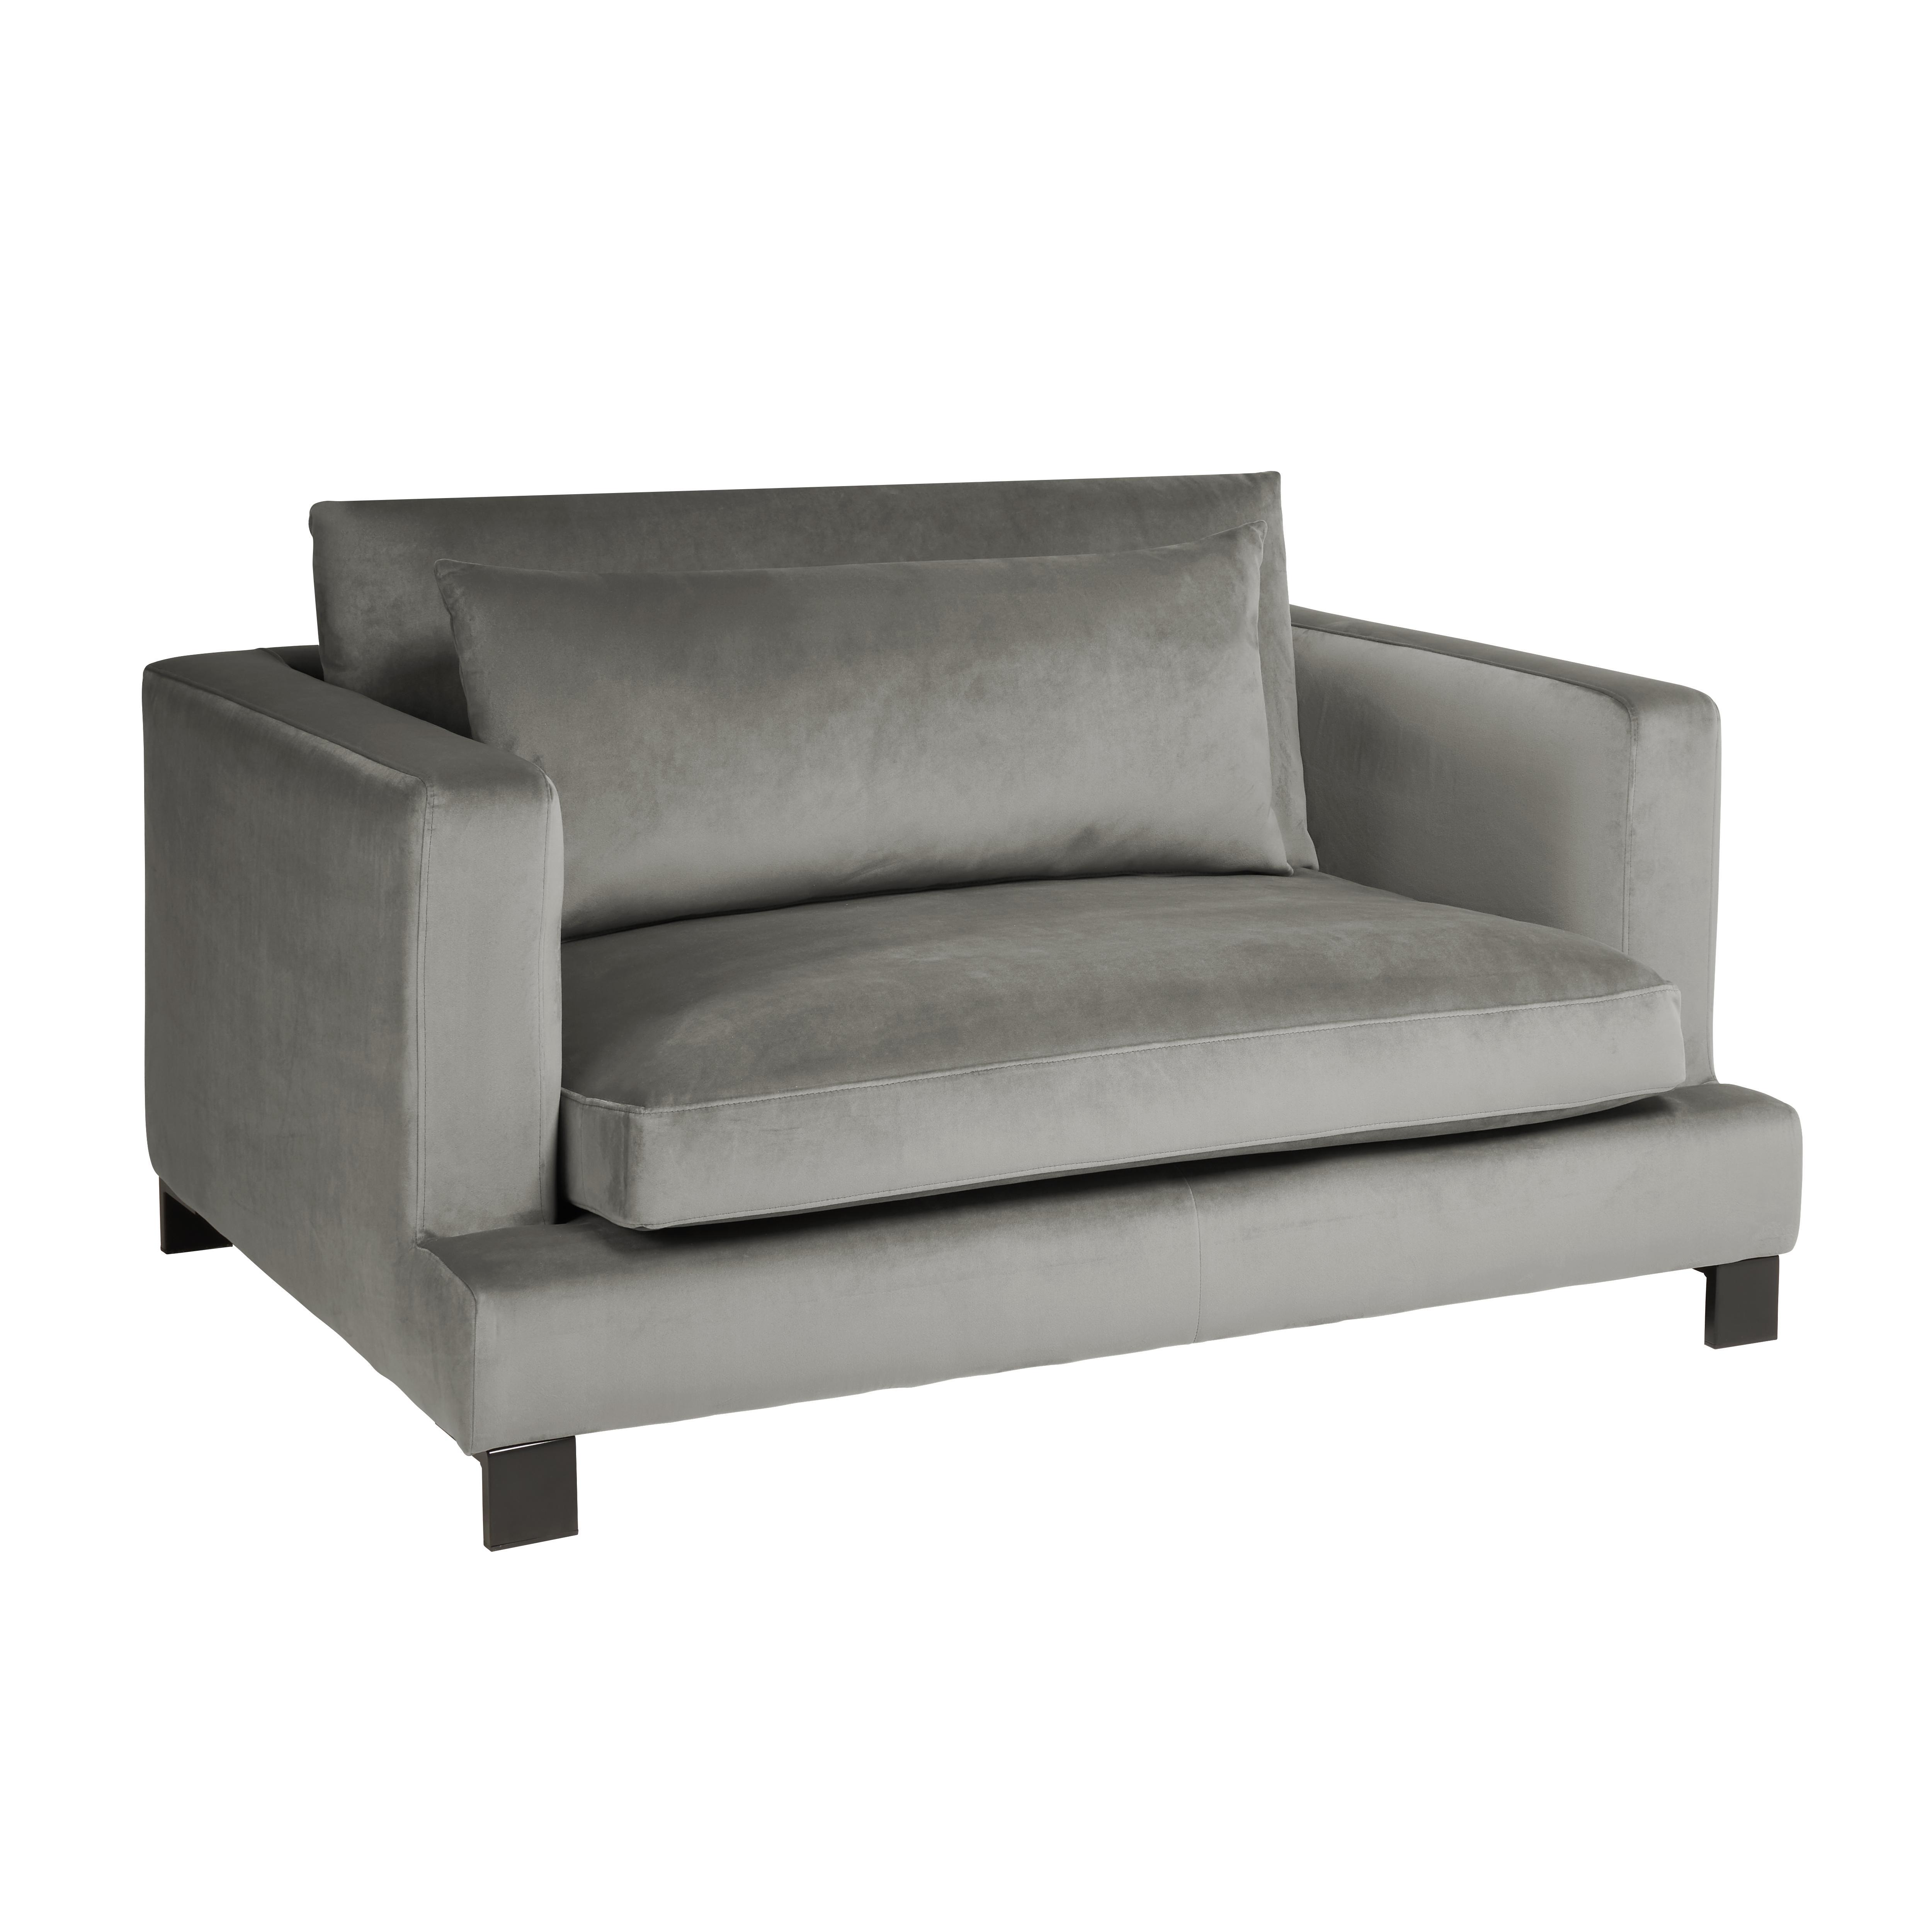 Lugano II cuddler sofa alba velvet grey